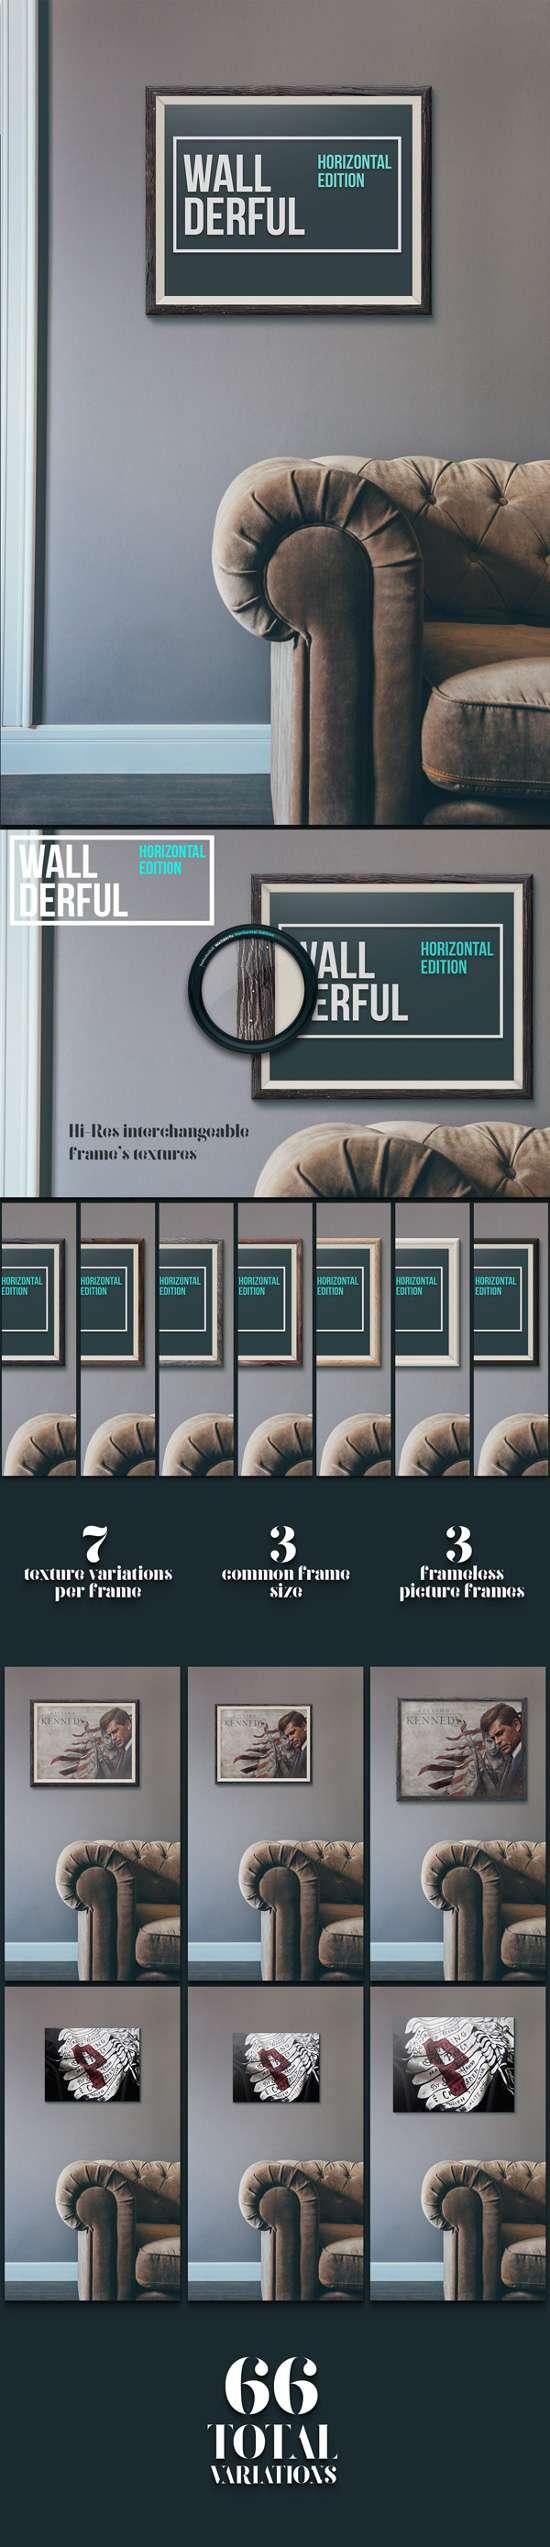 wallderful_horizontal_frames_mockups